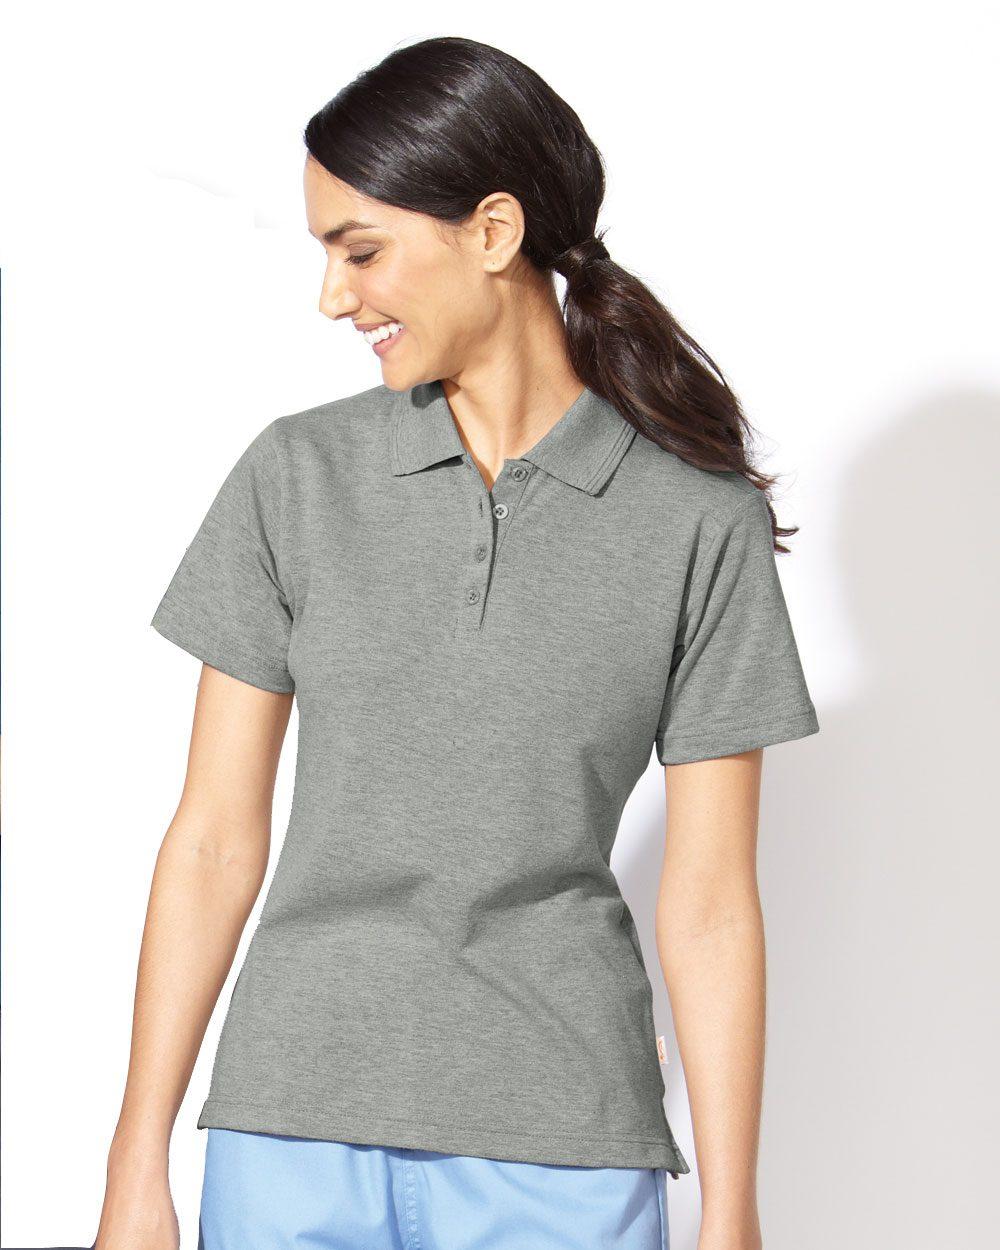 FeatherLite 5330 Ladies' Short Sleeve Platinum Pique Sport Shirt